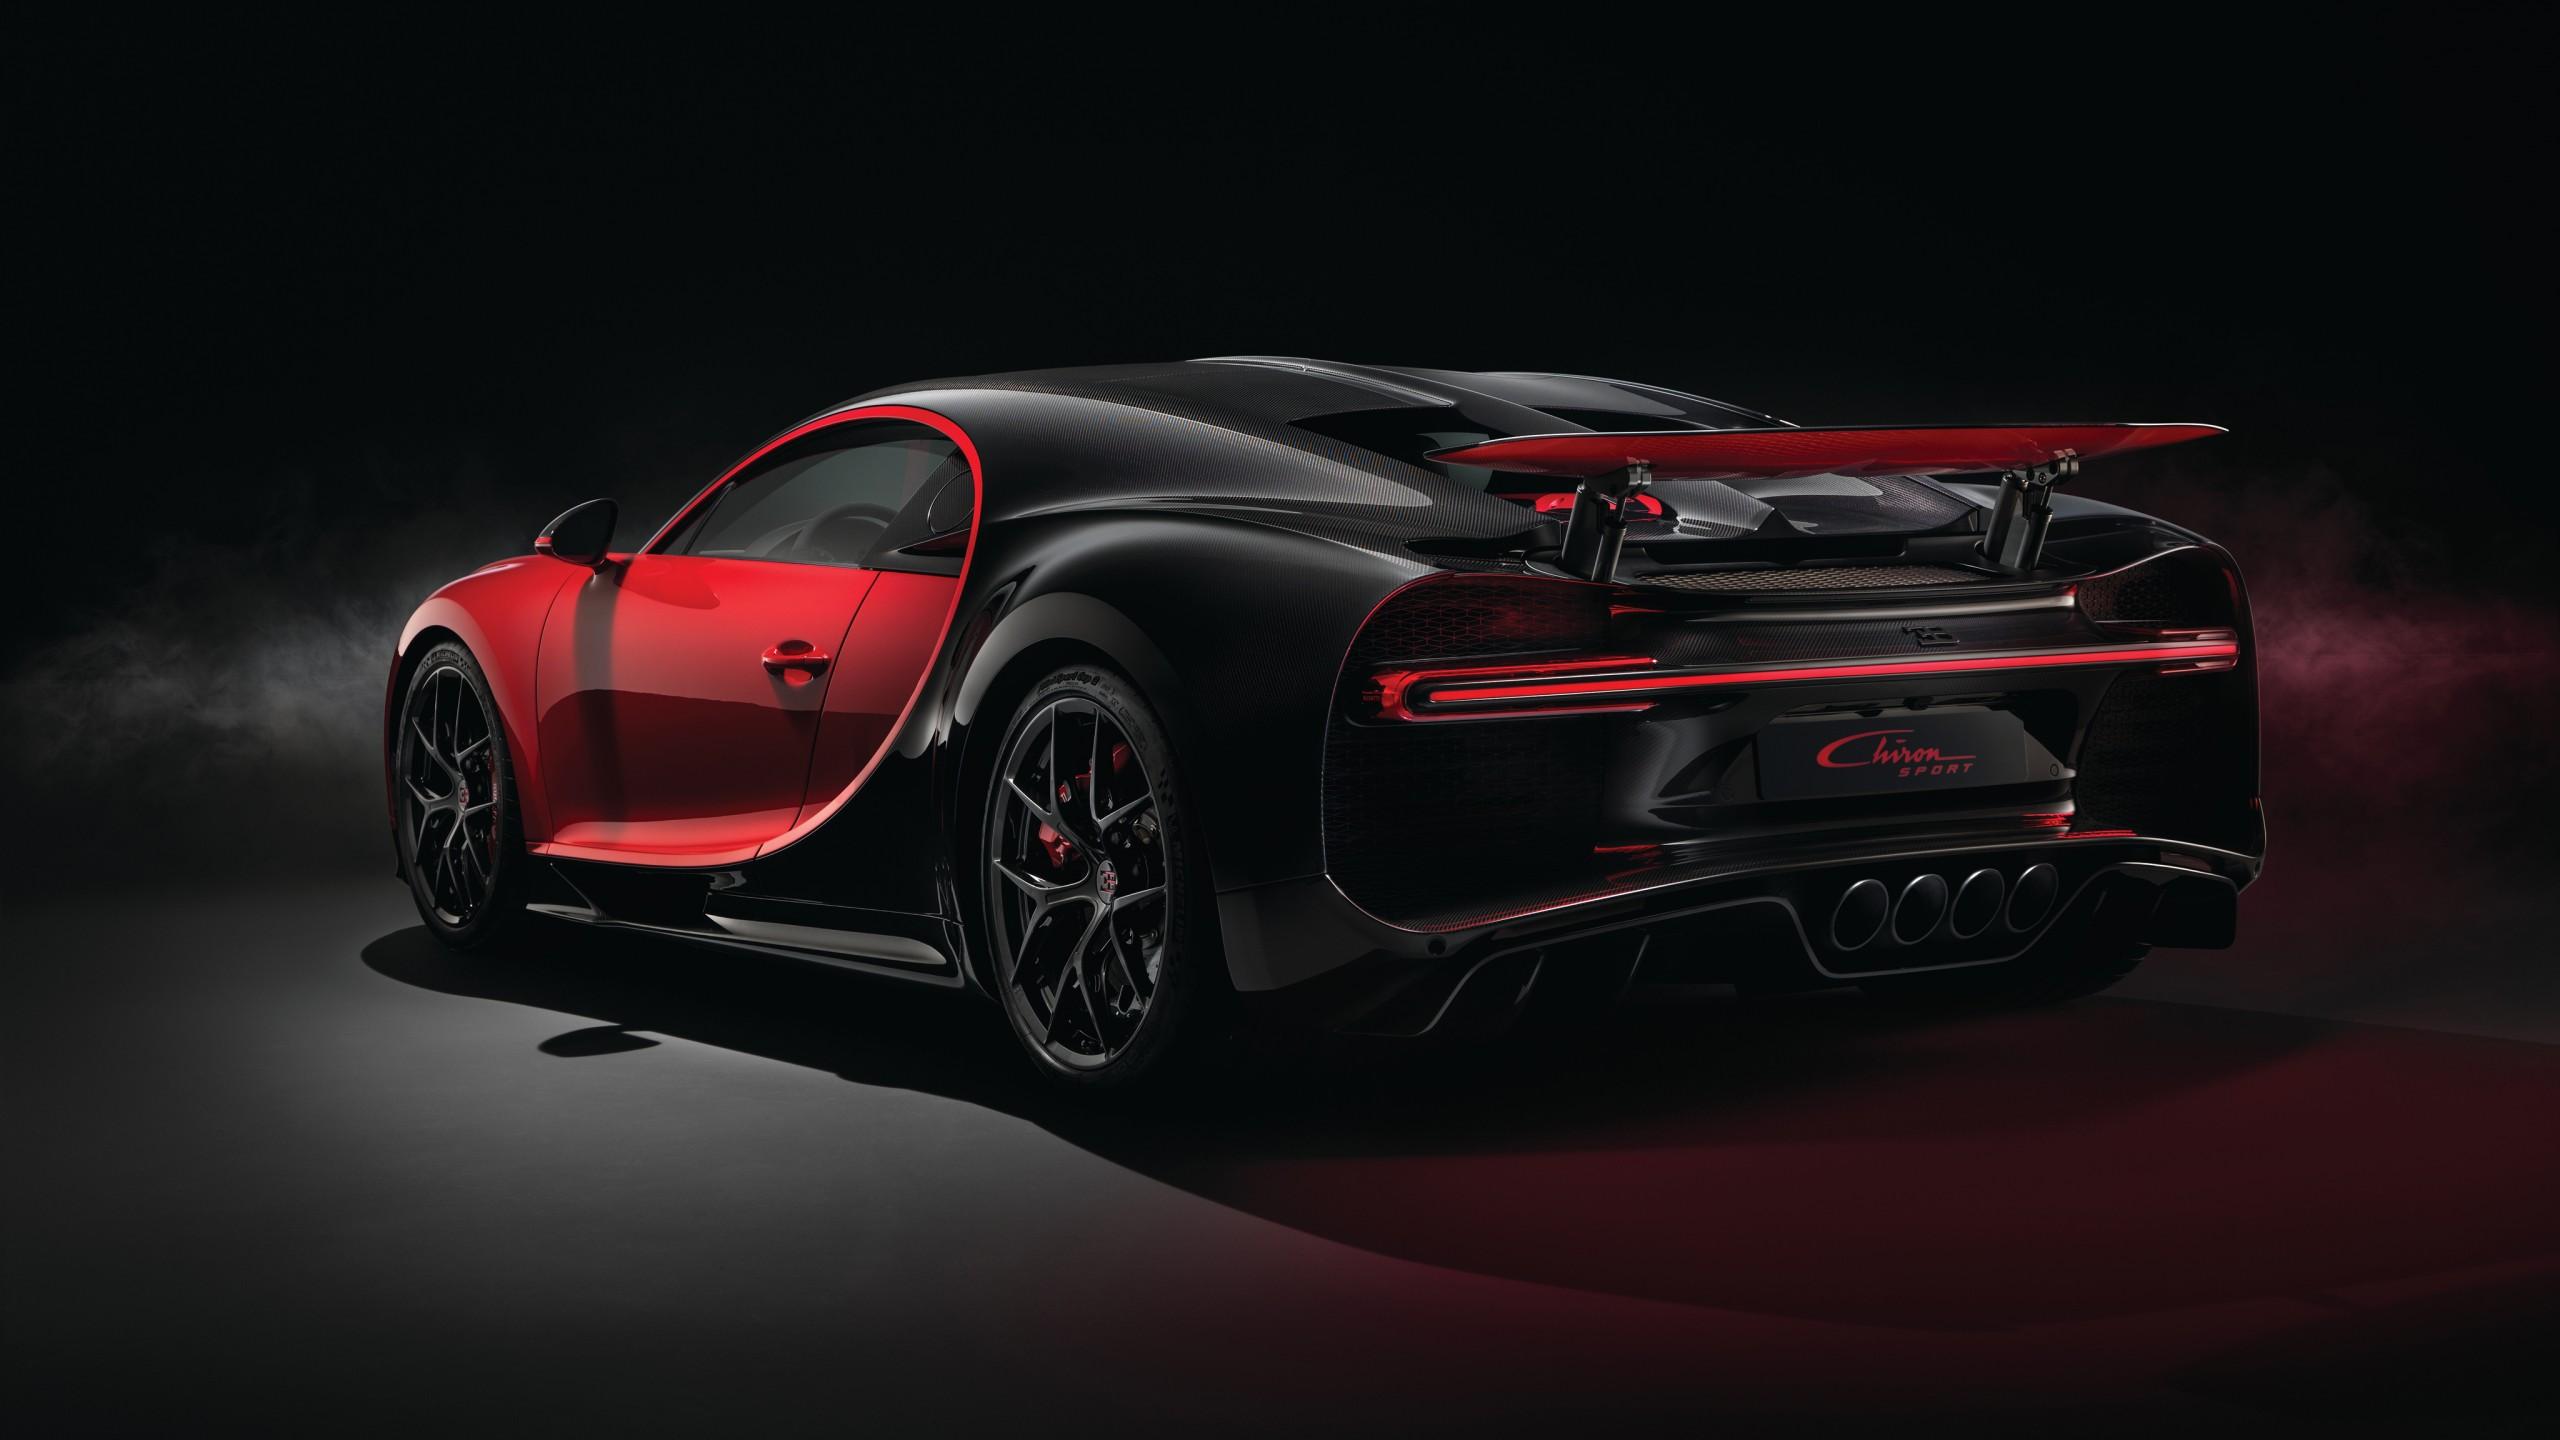 Ferrari Iphone 6 Wallpaper 2018 Bugatti Chiron Sport 4k 6 Wallpaper Hd Car